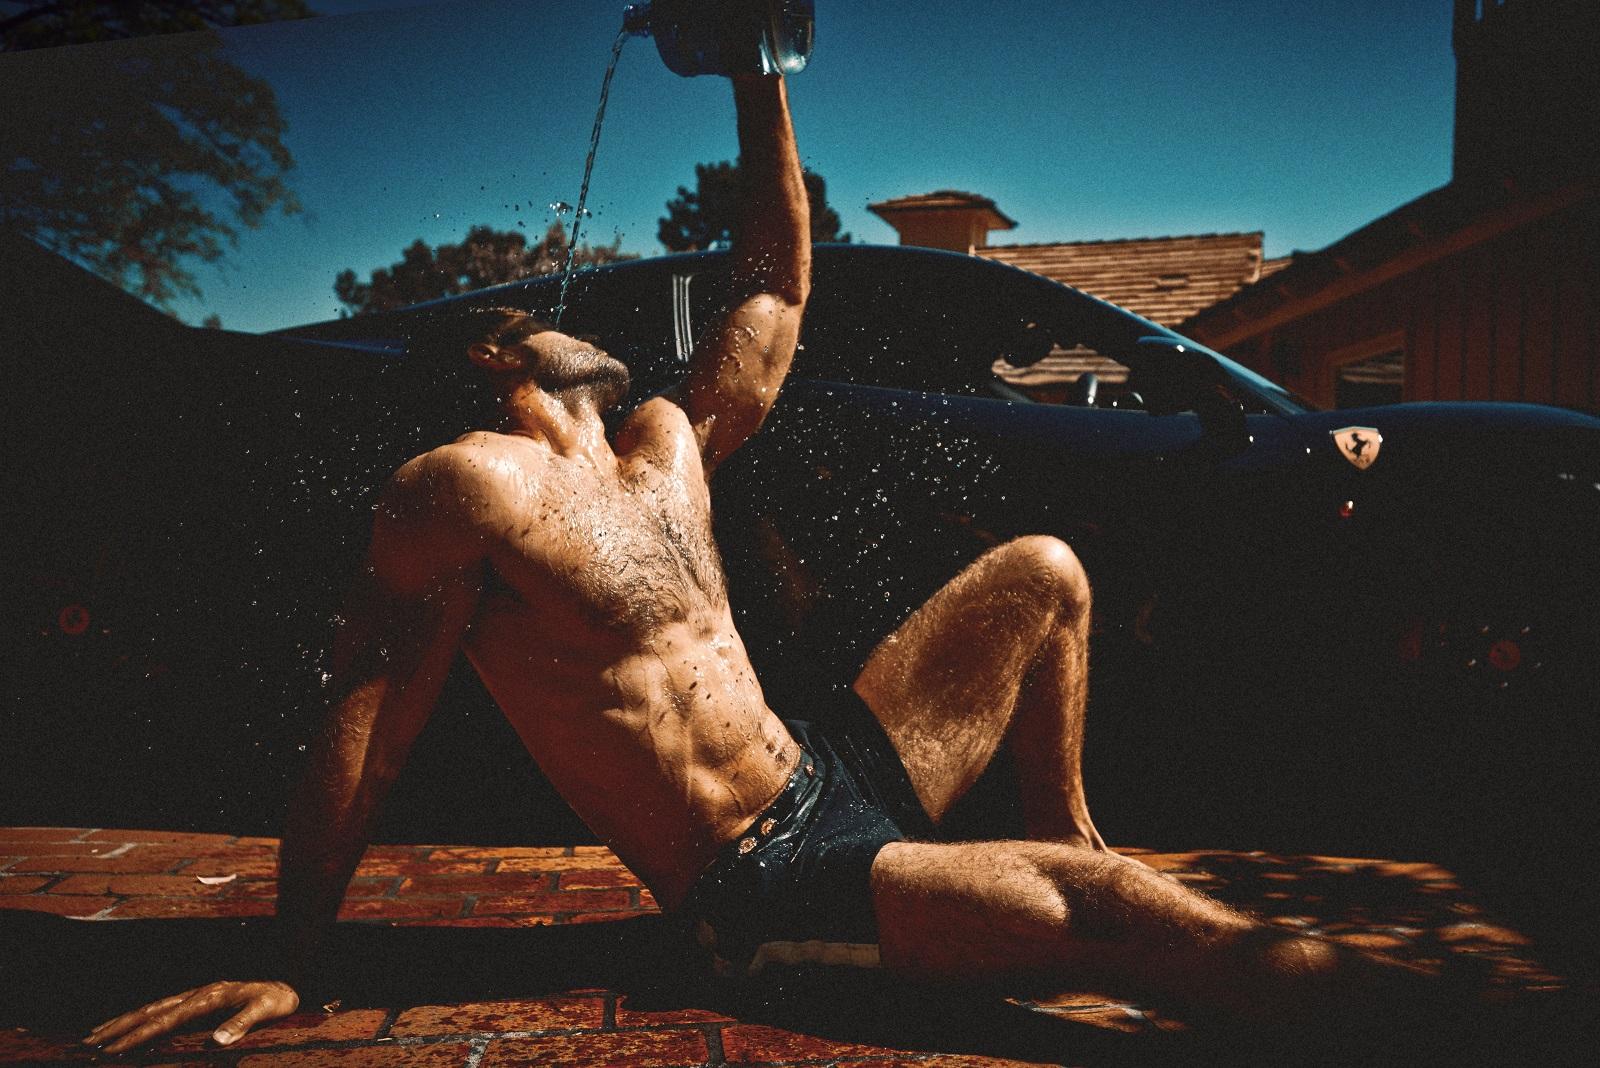 Cool Summer by Brian Kaminski9